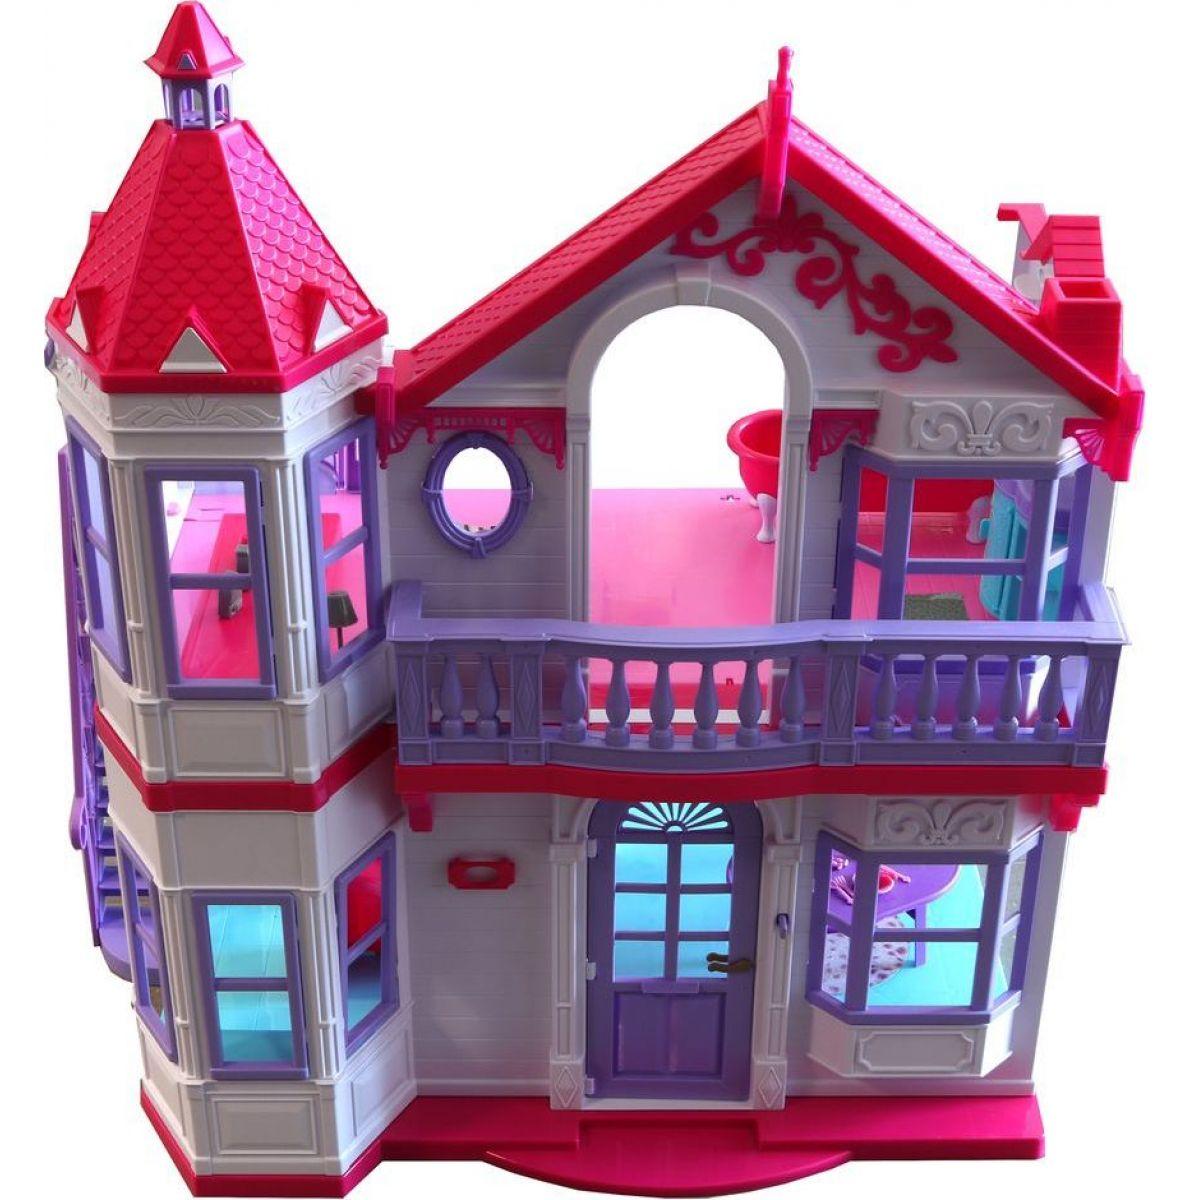 Domček pre bábiku 4528